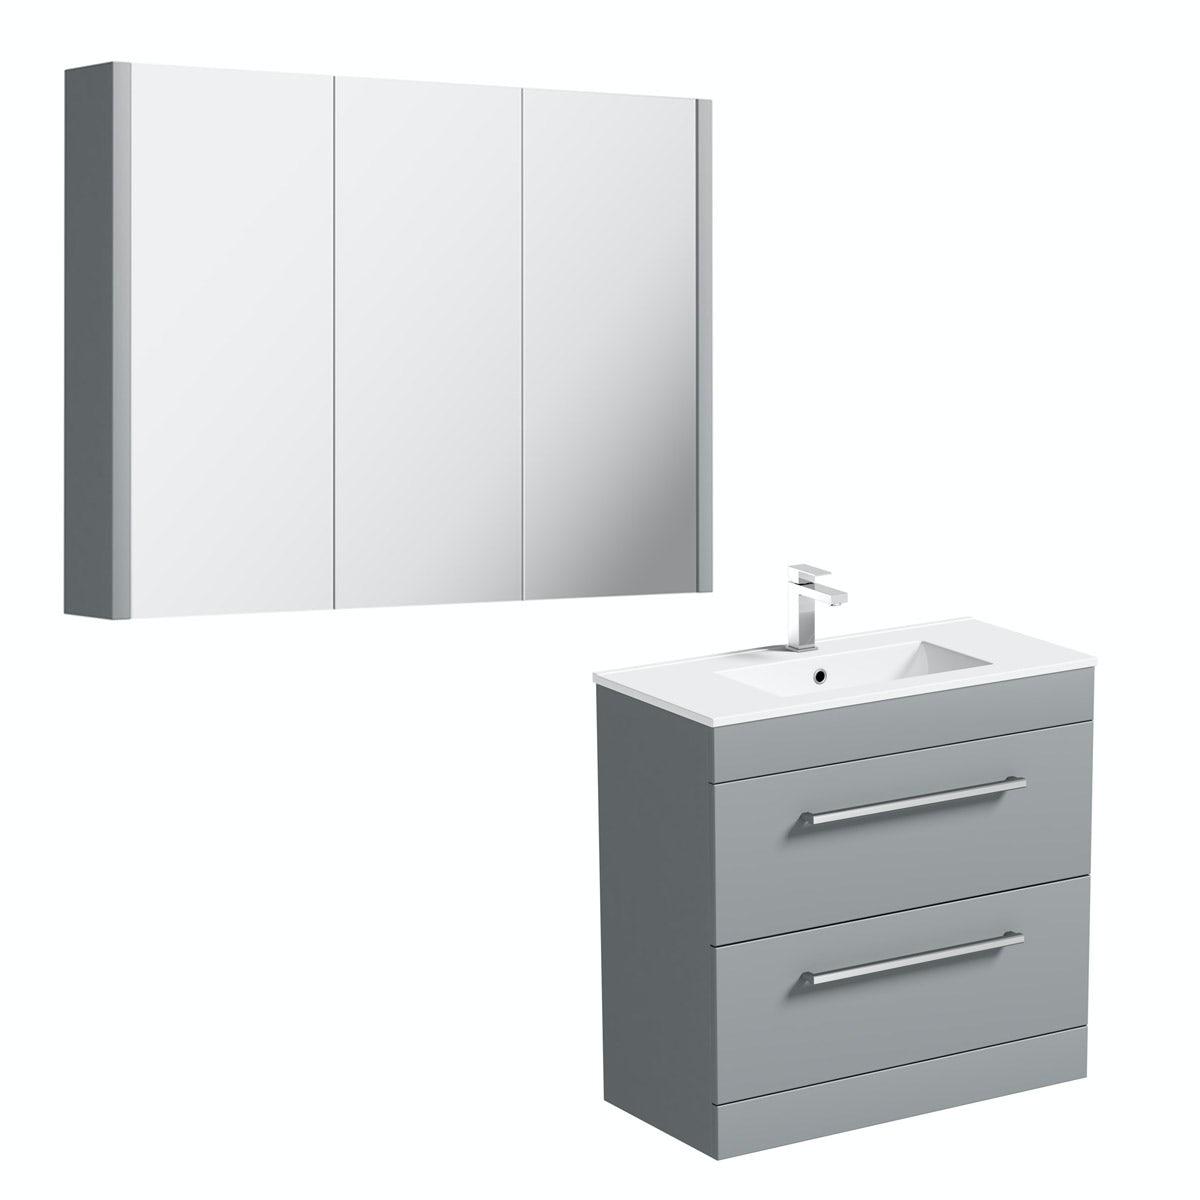 Orchard Derwent stone grey vanity drawer unit 800mm and mirror 900mm